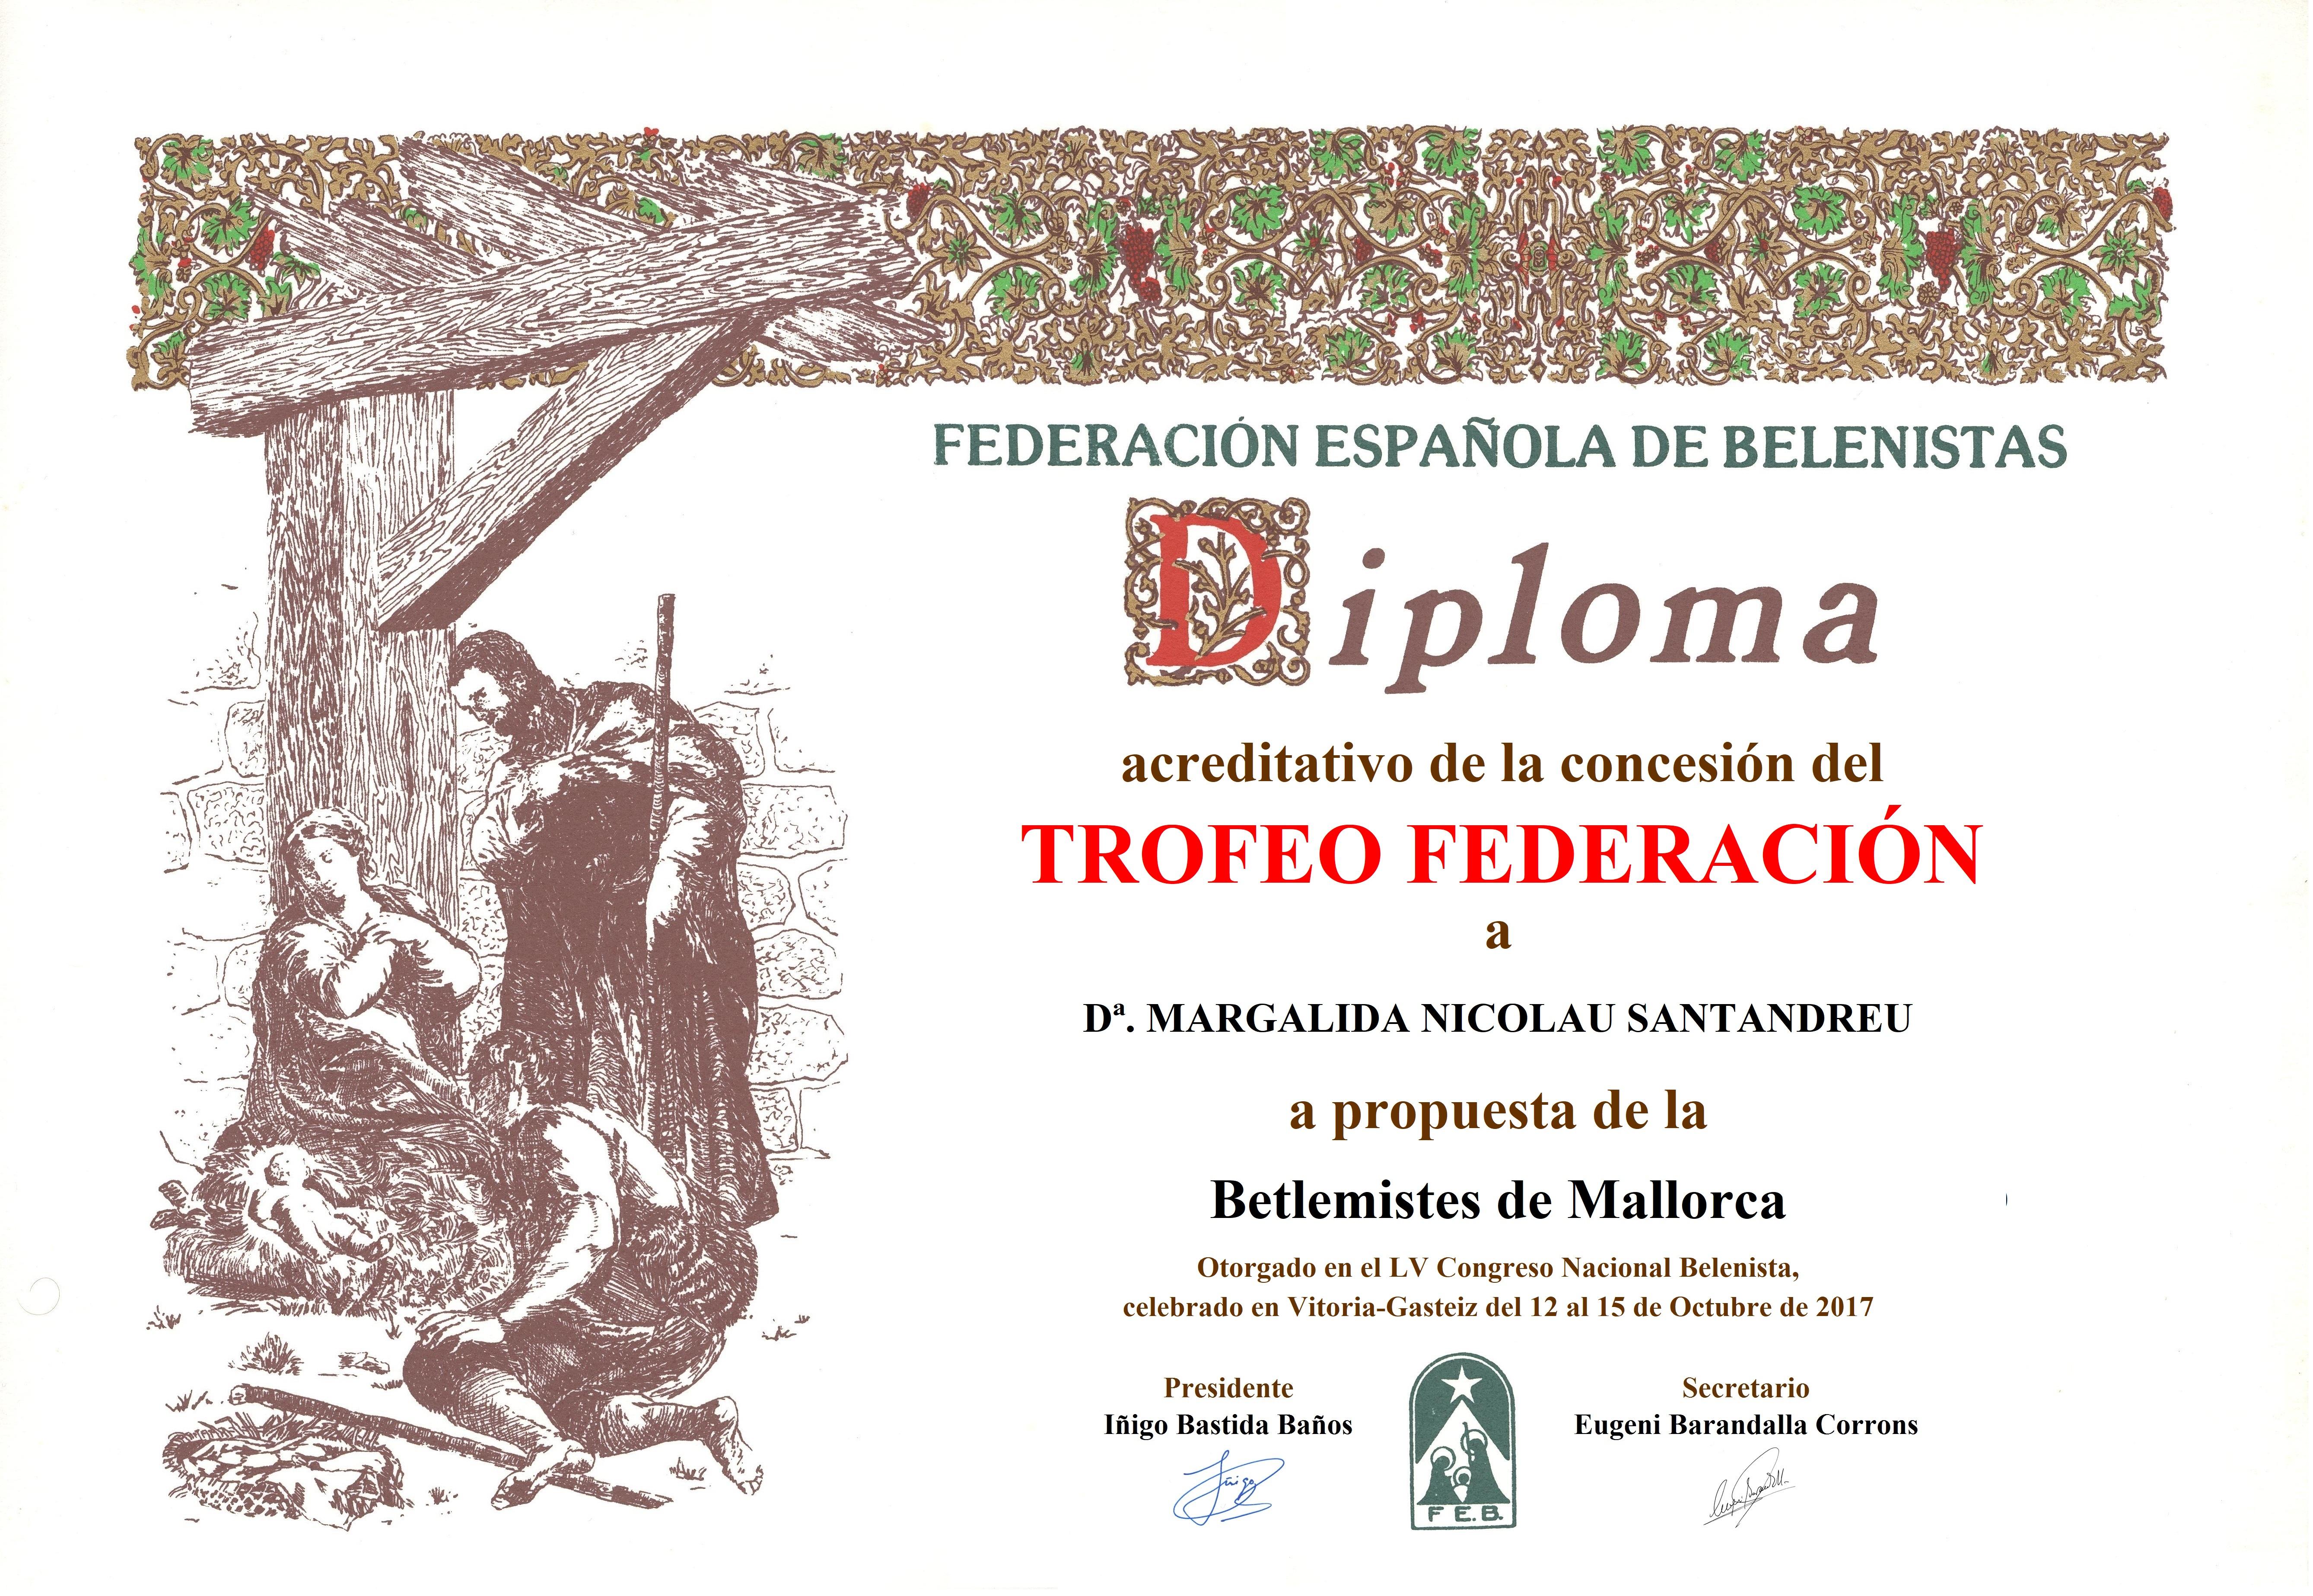 Margalida Nicolau Santandreu – Diploma Trofeo FEB 2017